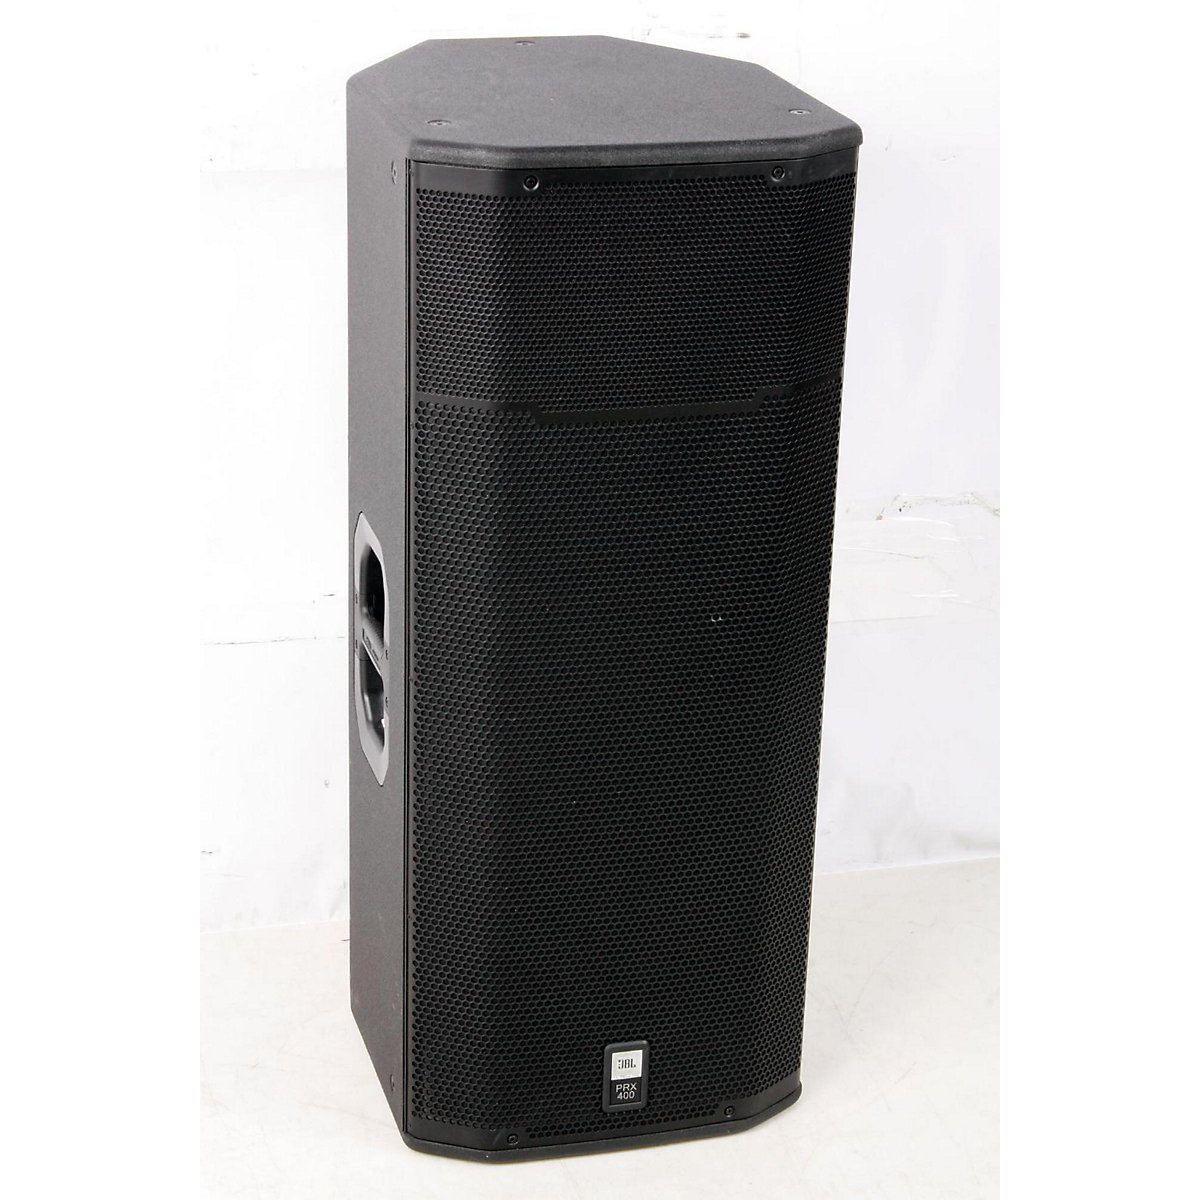 JBL PRX425 2-Way Loudspeaker System